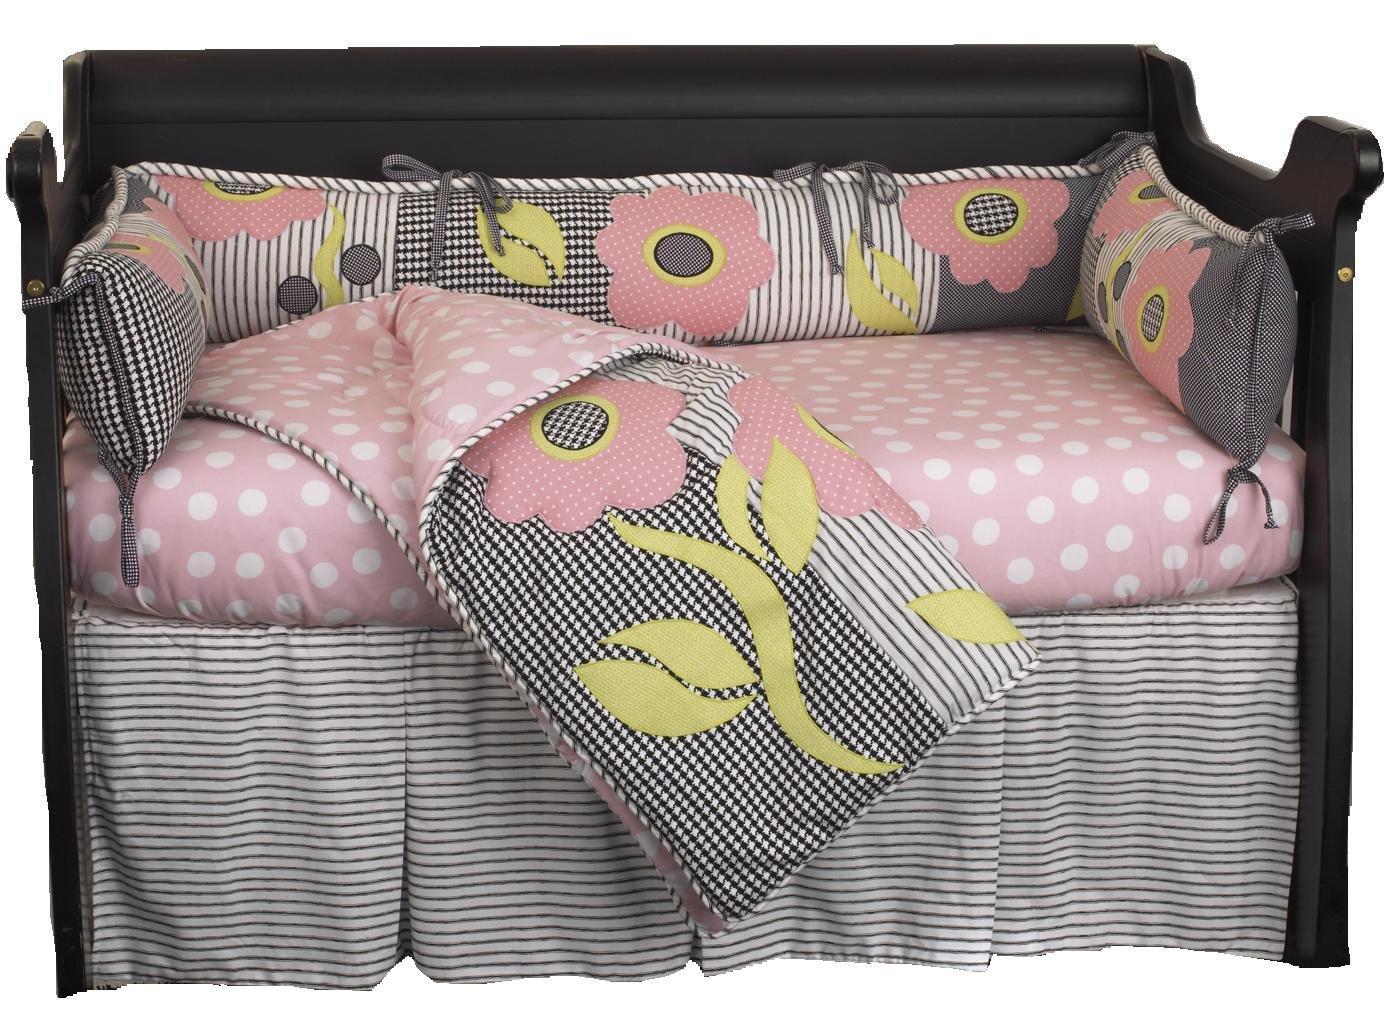 Cotton Tale Designs Poppy 4 Piece Crib Bedding Set by Cotton Tale Designs   B001NCELEA